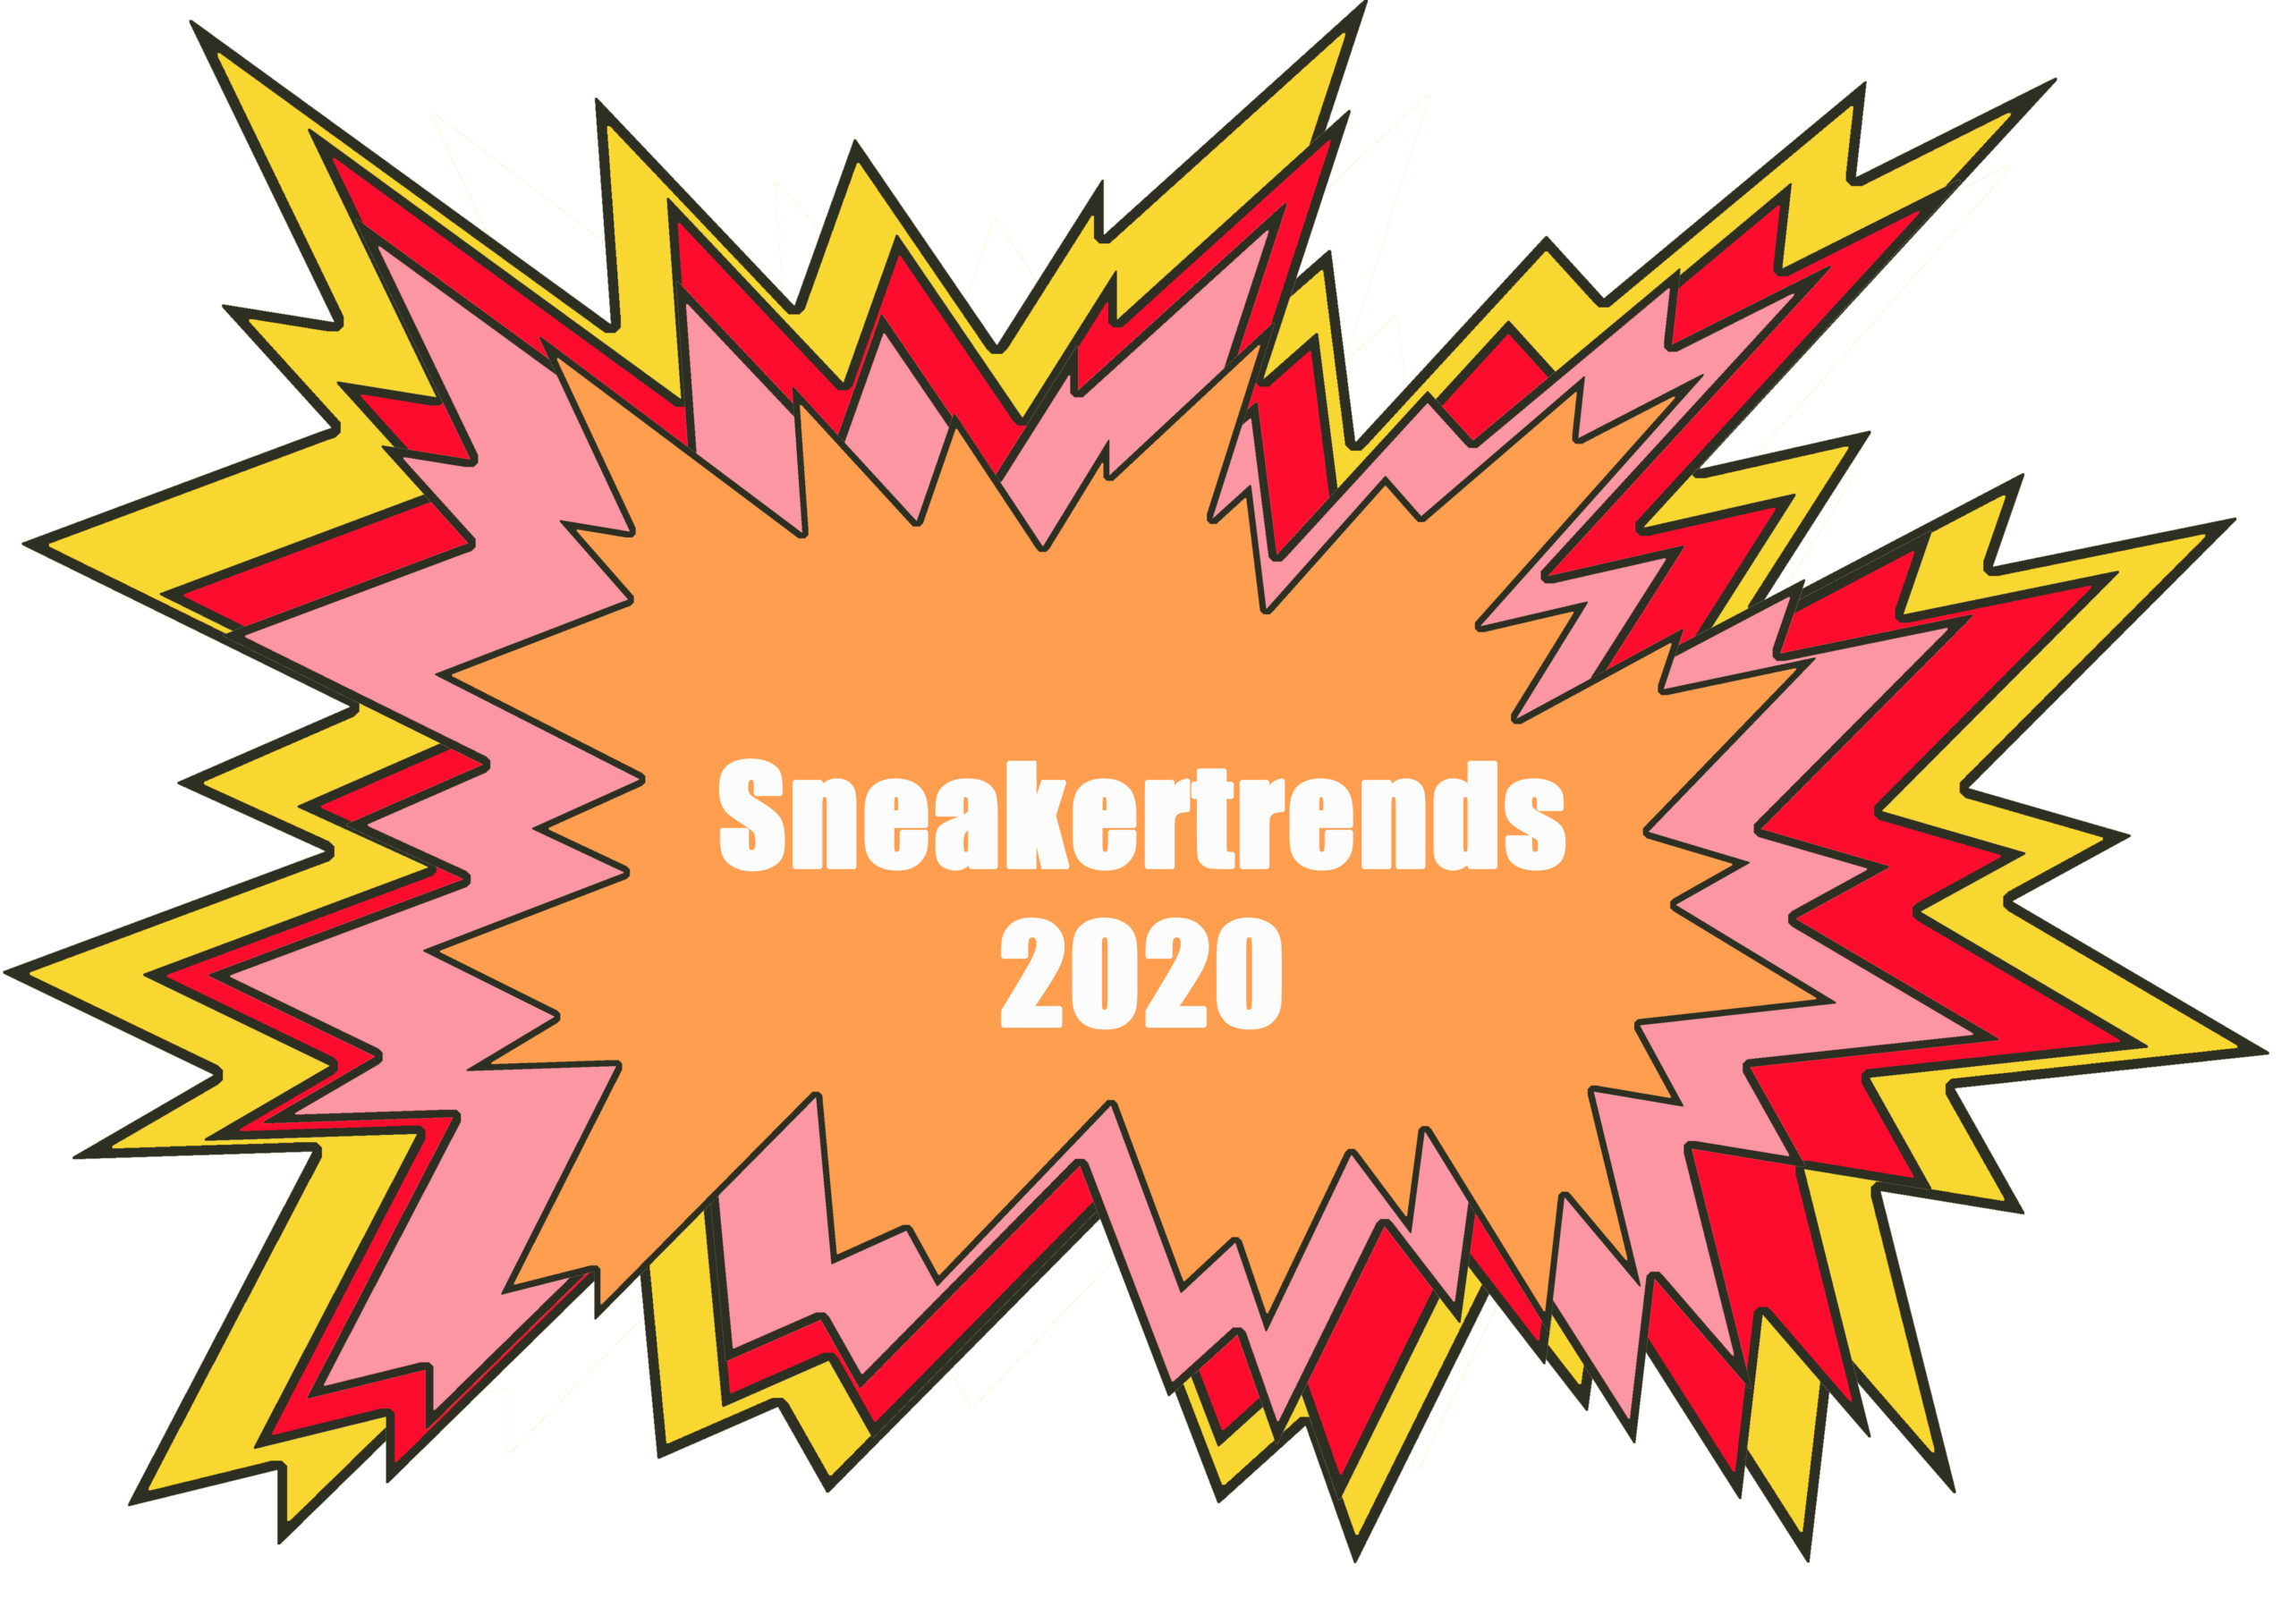 Das sind die Sneaker-Trends 2020!